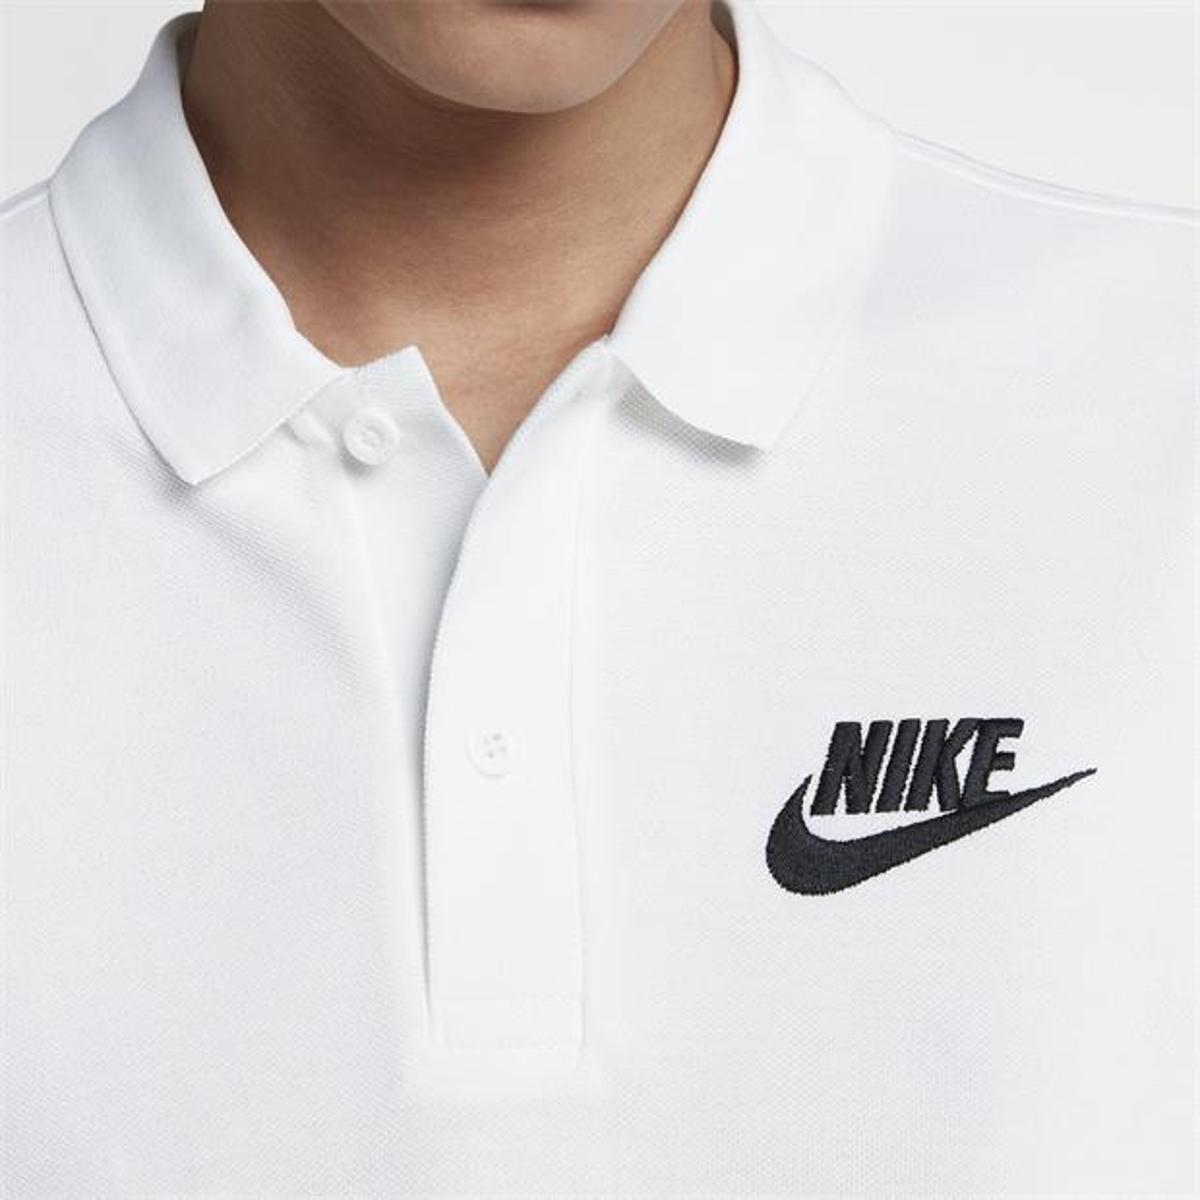 Camisa Polo Nike Matchup Piquet Masculina - Compre Agora  ecab43d5c39d0